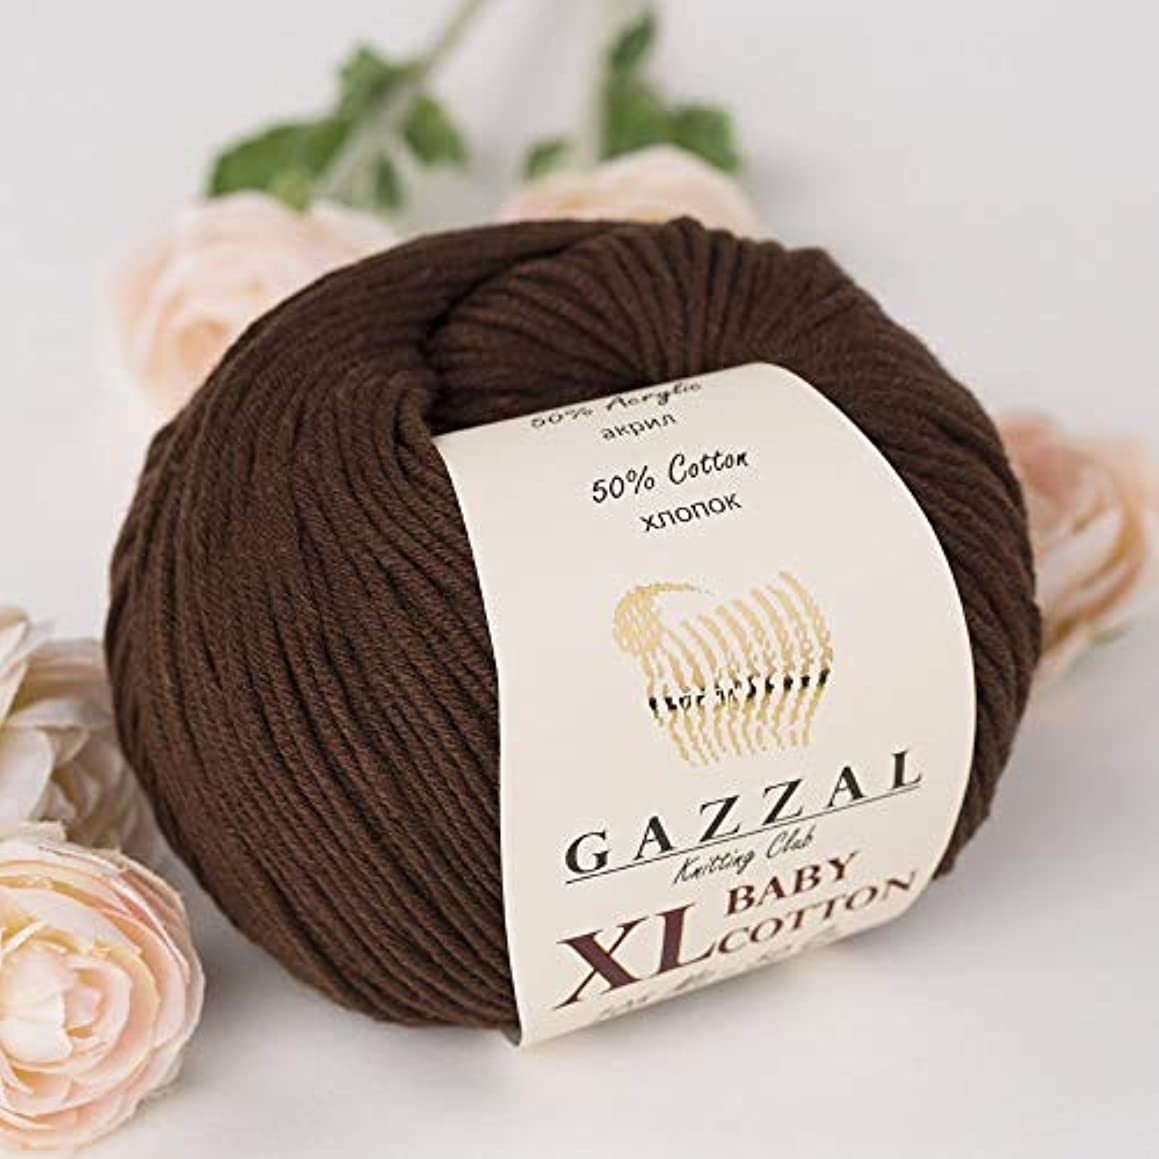 3 Pack (Ball) Gazzal Baby Cotton XL Total 5.28 Oz / 344 Yrds, Each Ball 1.76 Oz (50g) / 246 Yrds (225m) Super Soft, DK- Worsted Baby Yarn, 50% Turkish Cotton, Brown - 3436